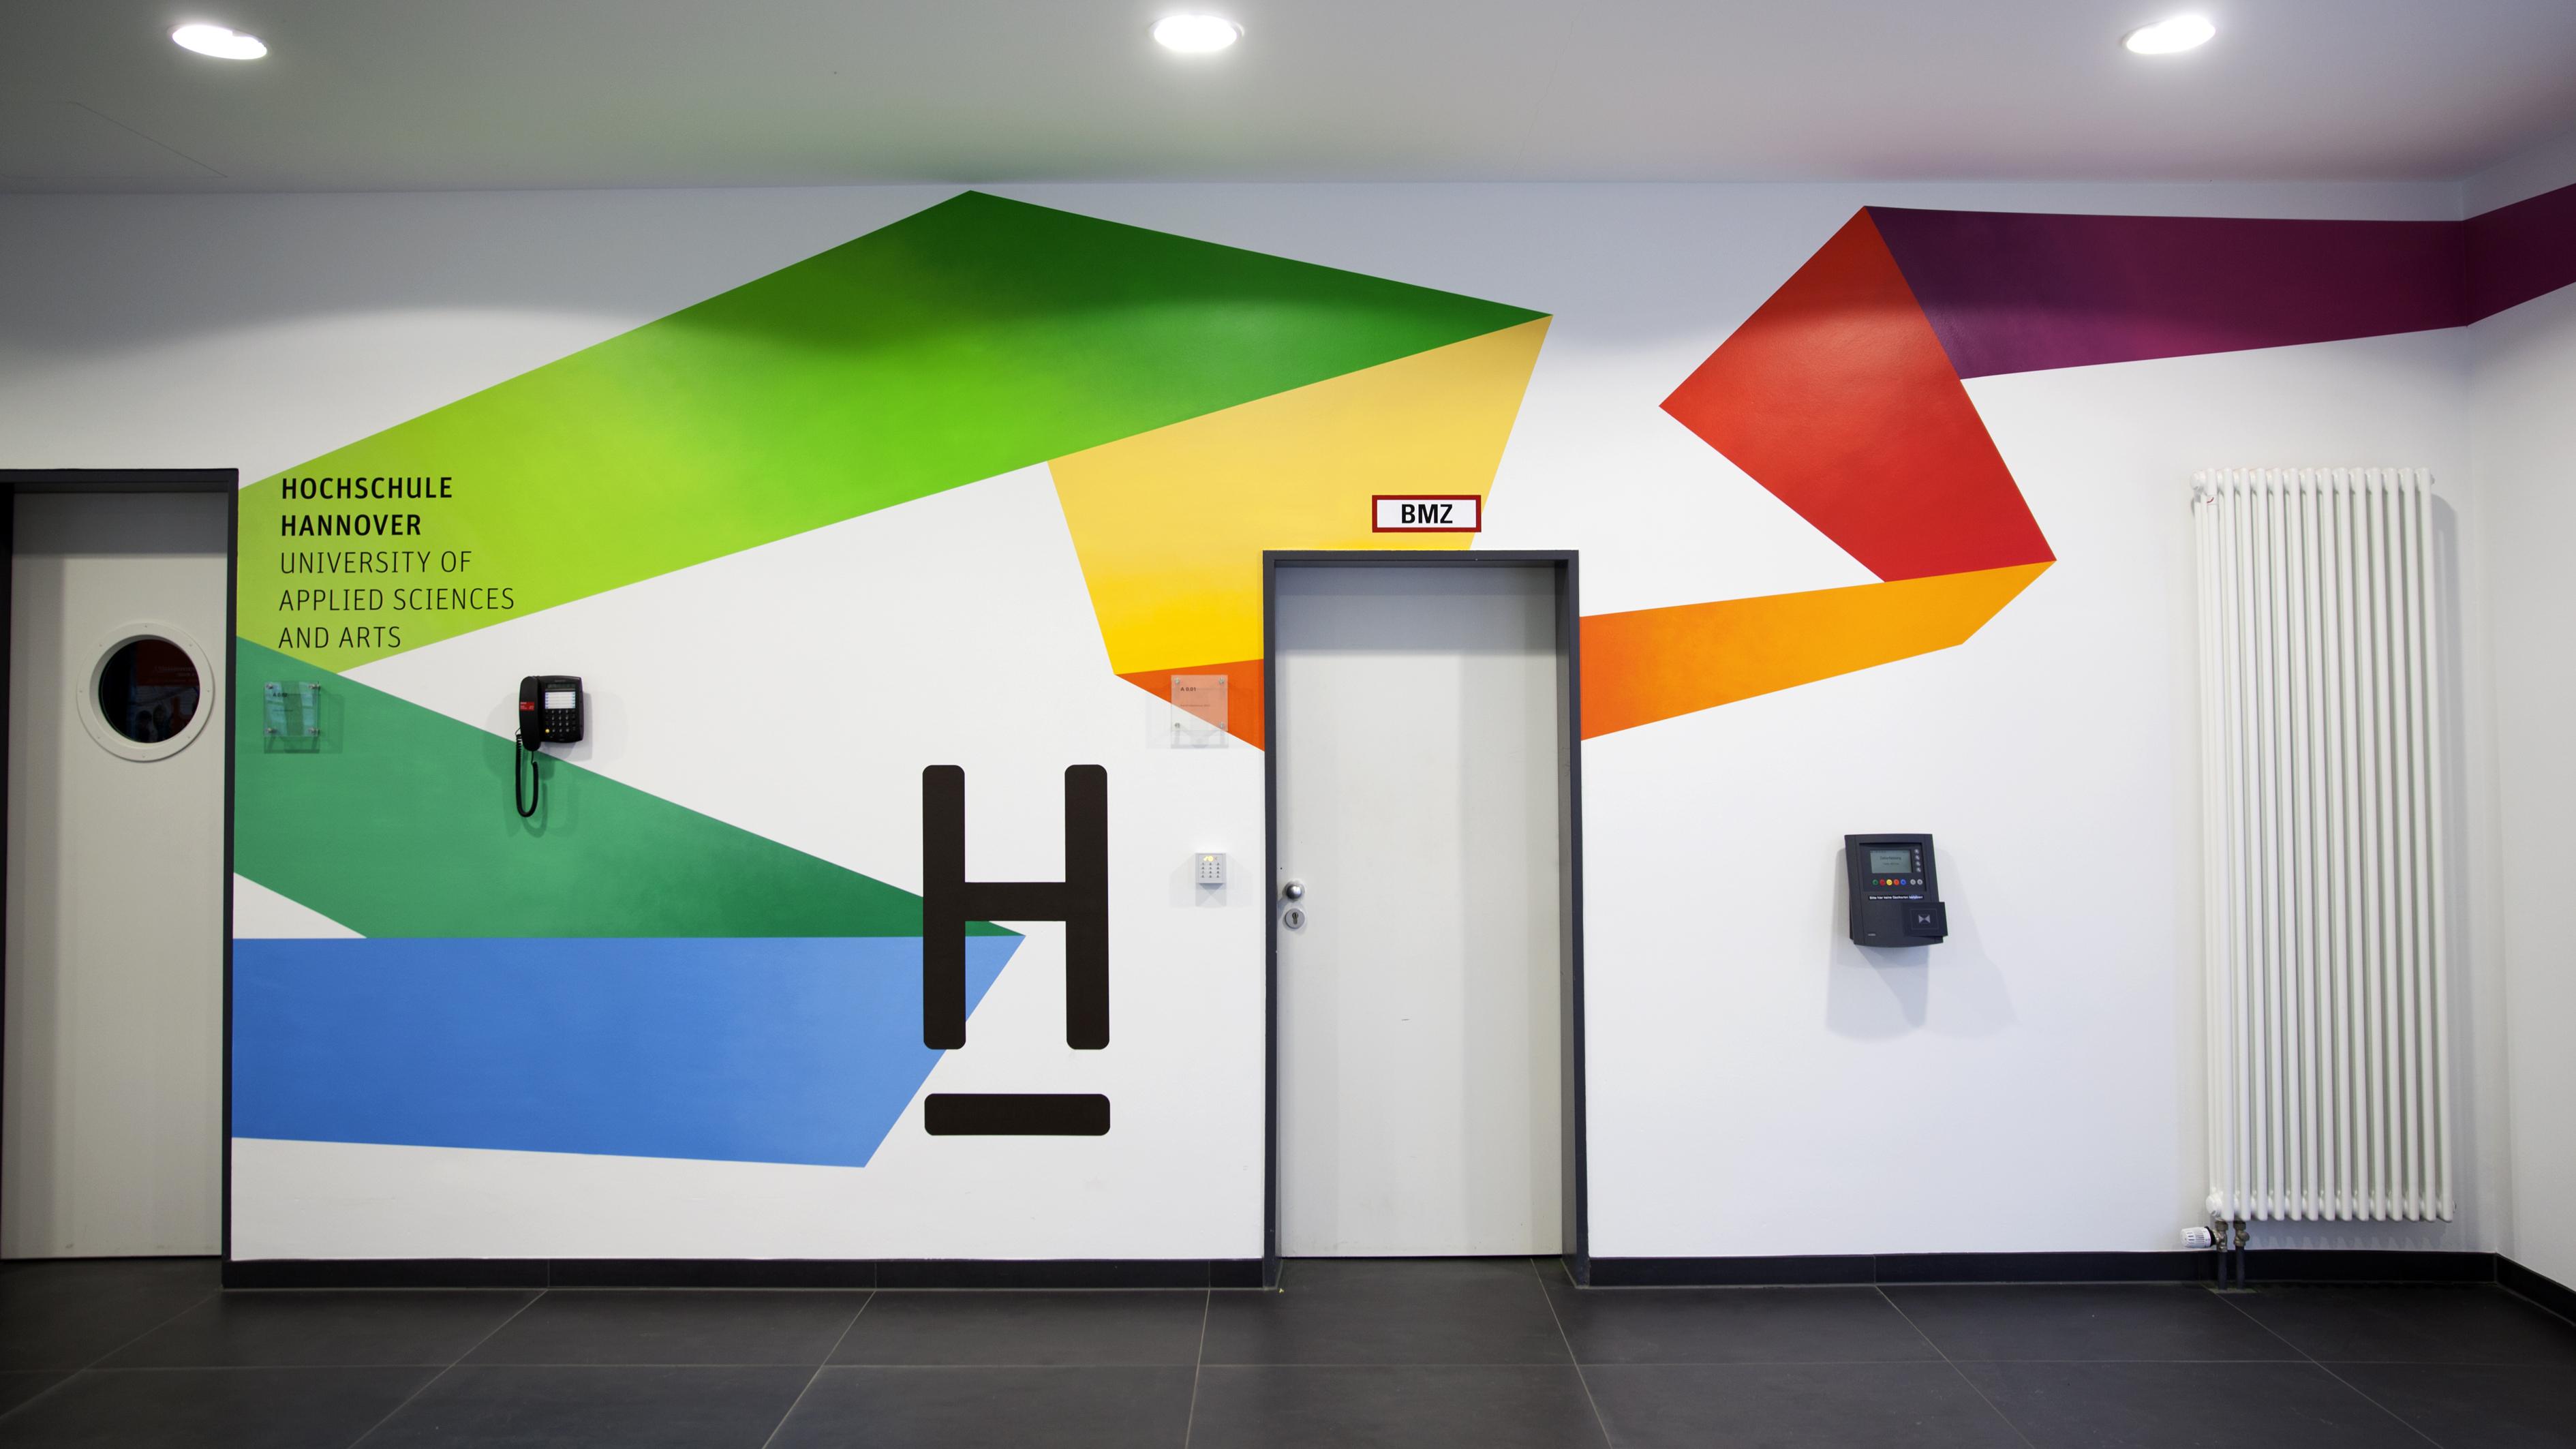 Hannover Graffiti Design Hochschule